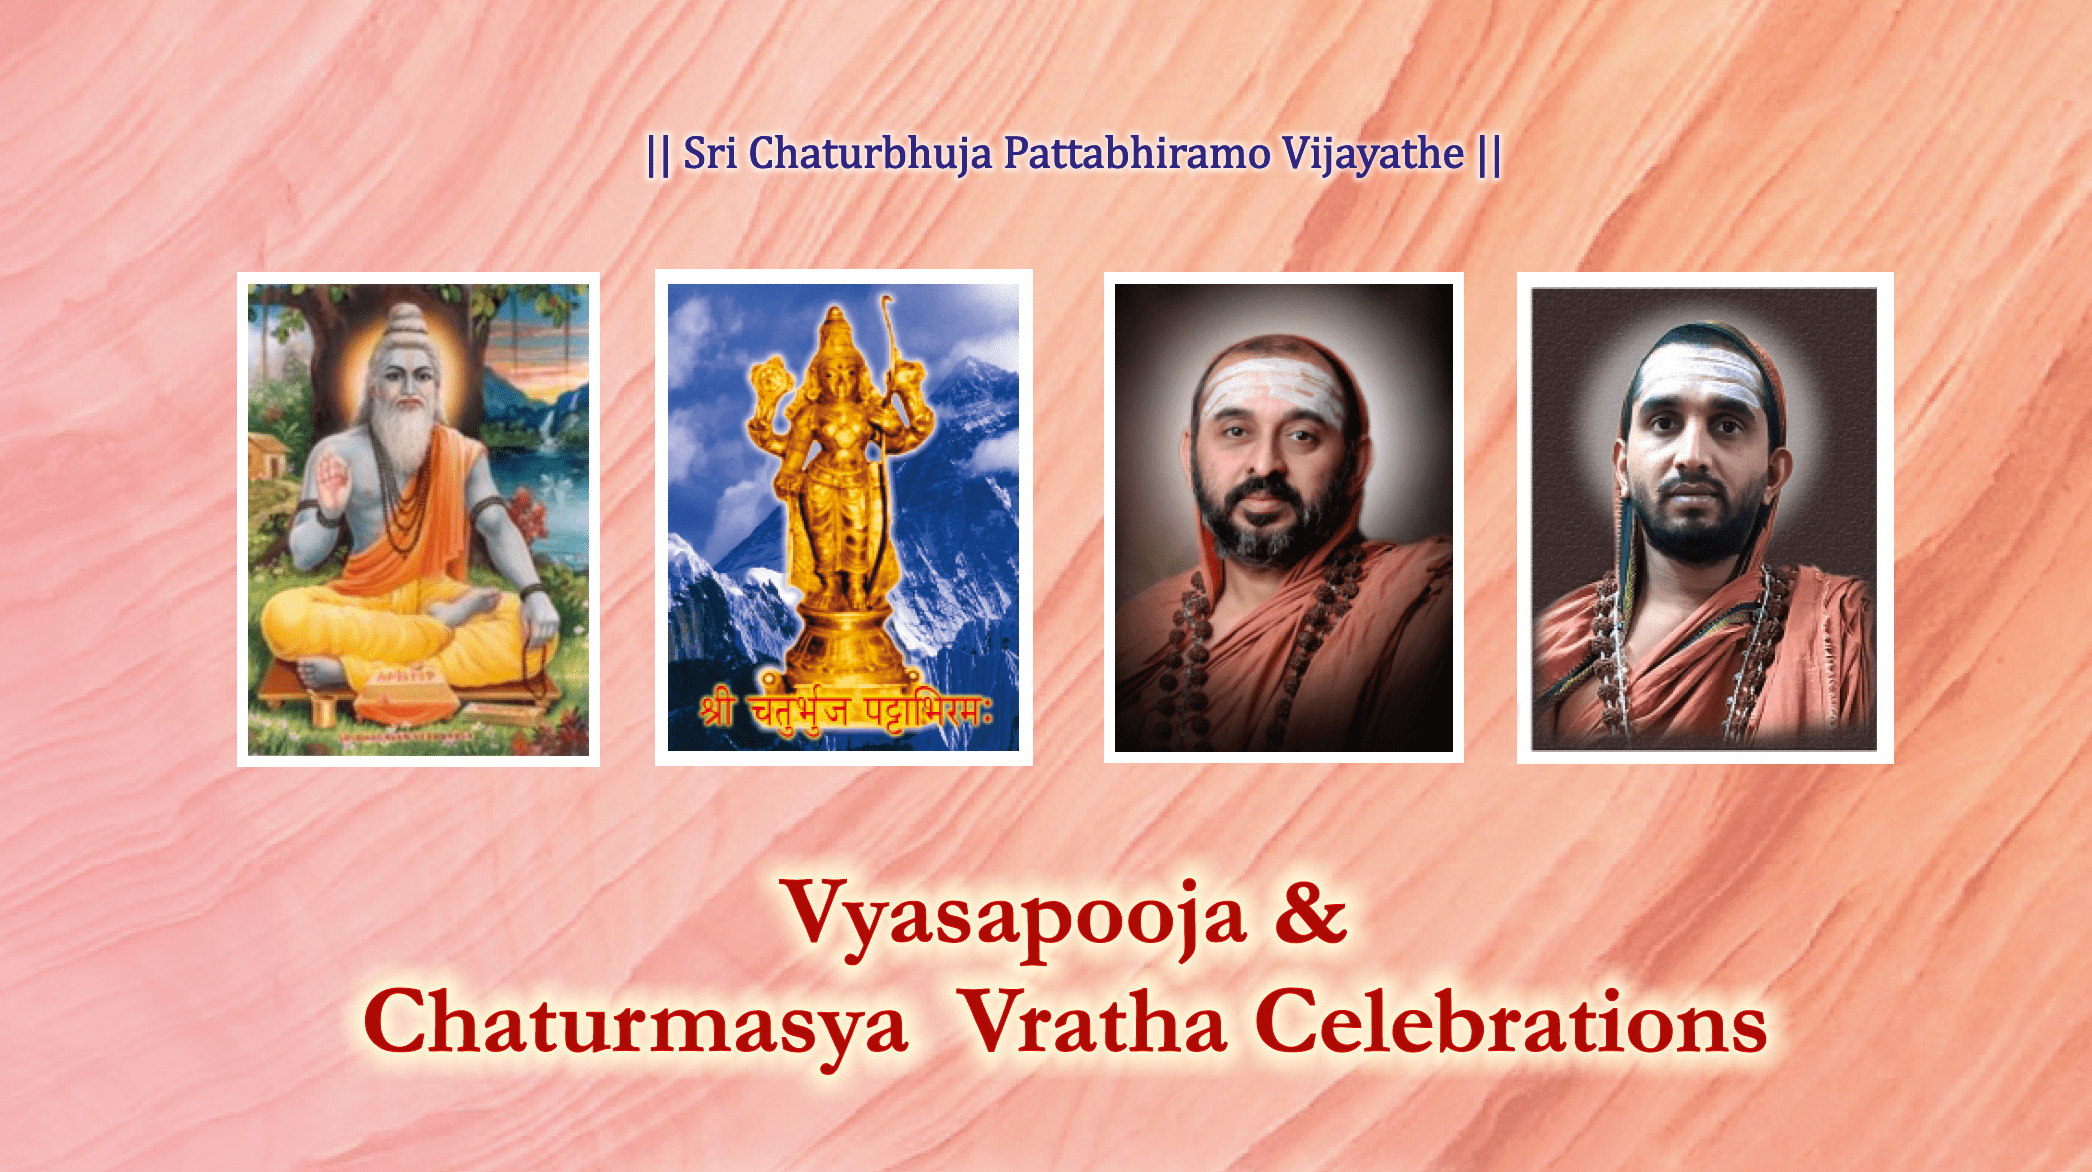 Chaturmasya Vratha Celebrations